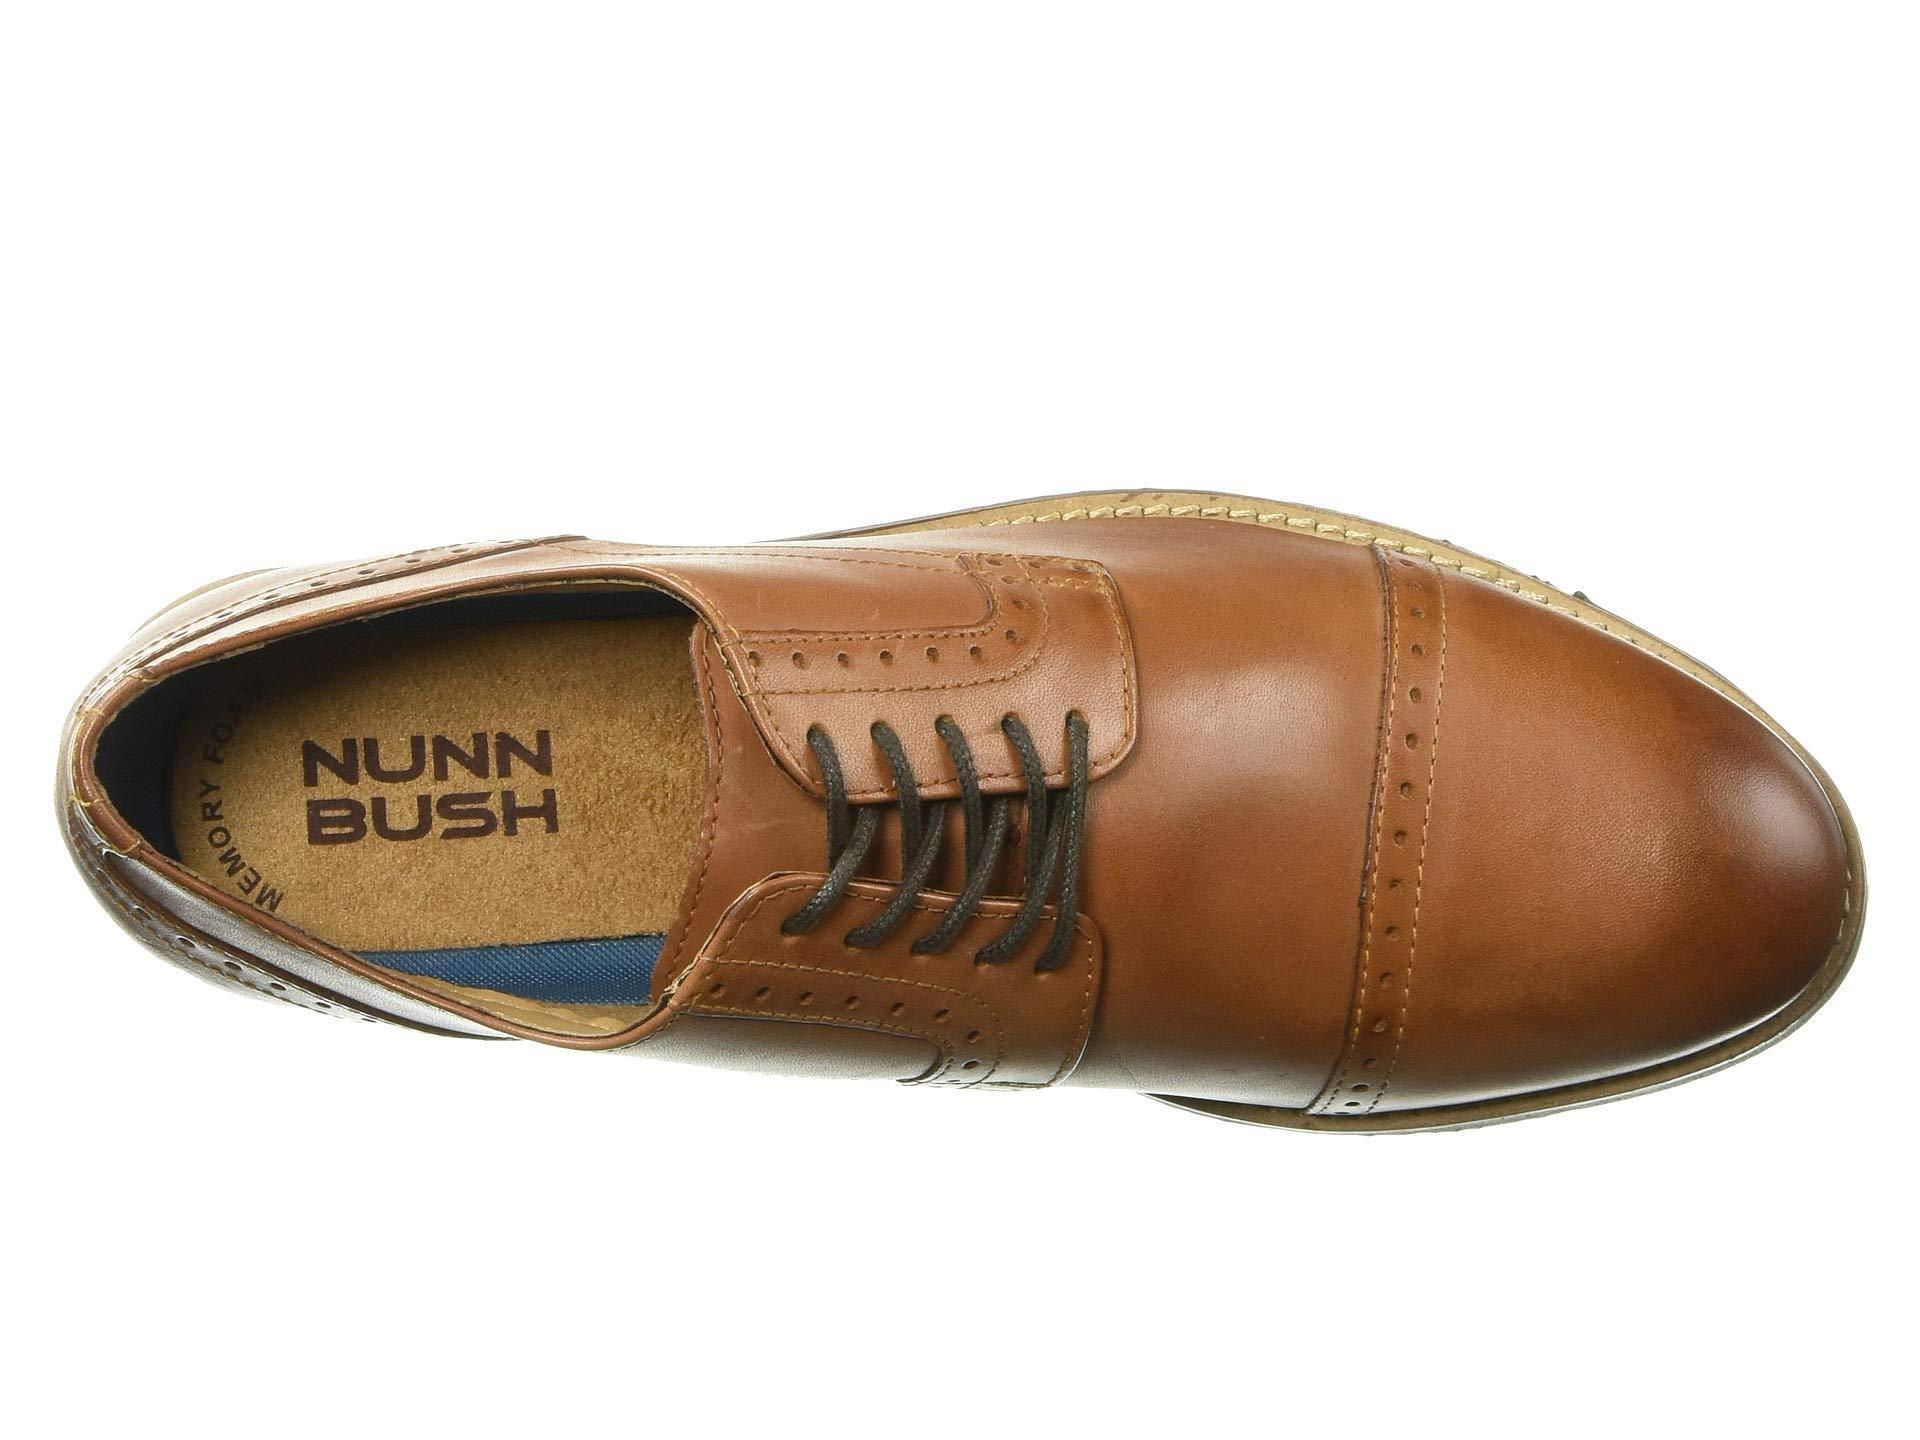 9d2af3e099986 Nunn Bush Middleton Cap Toe Oxford (cognac) Men's Shoes in Brown for ...